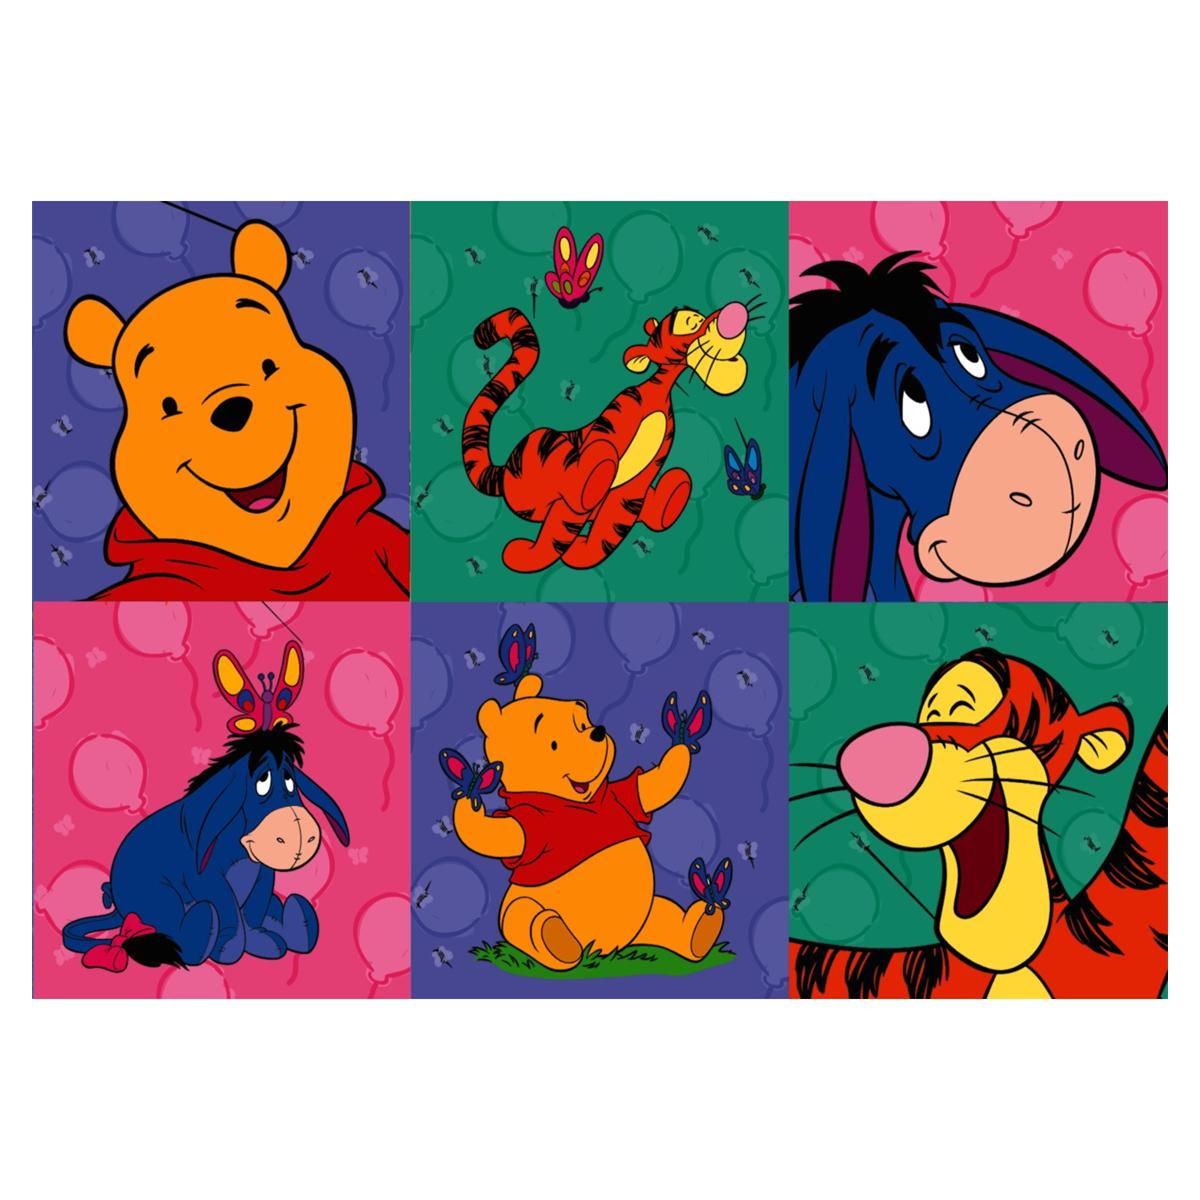 Stickers Winnie The Pooh 100pk